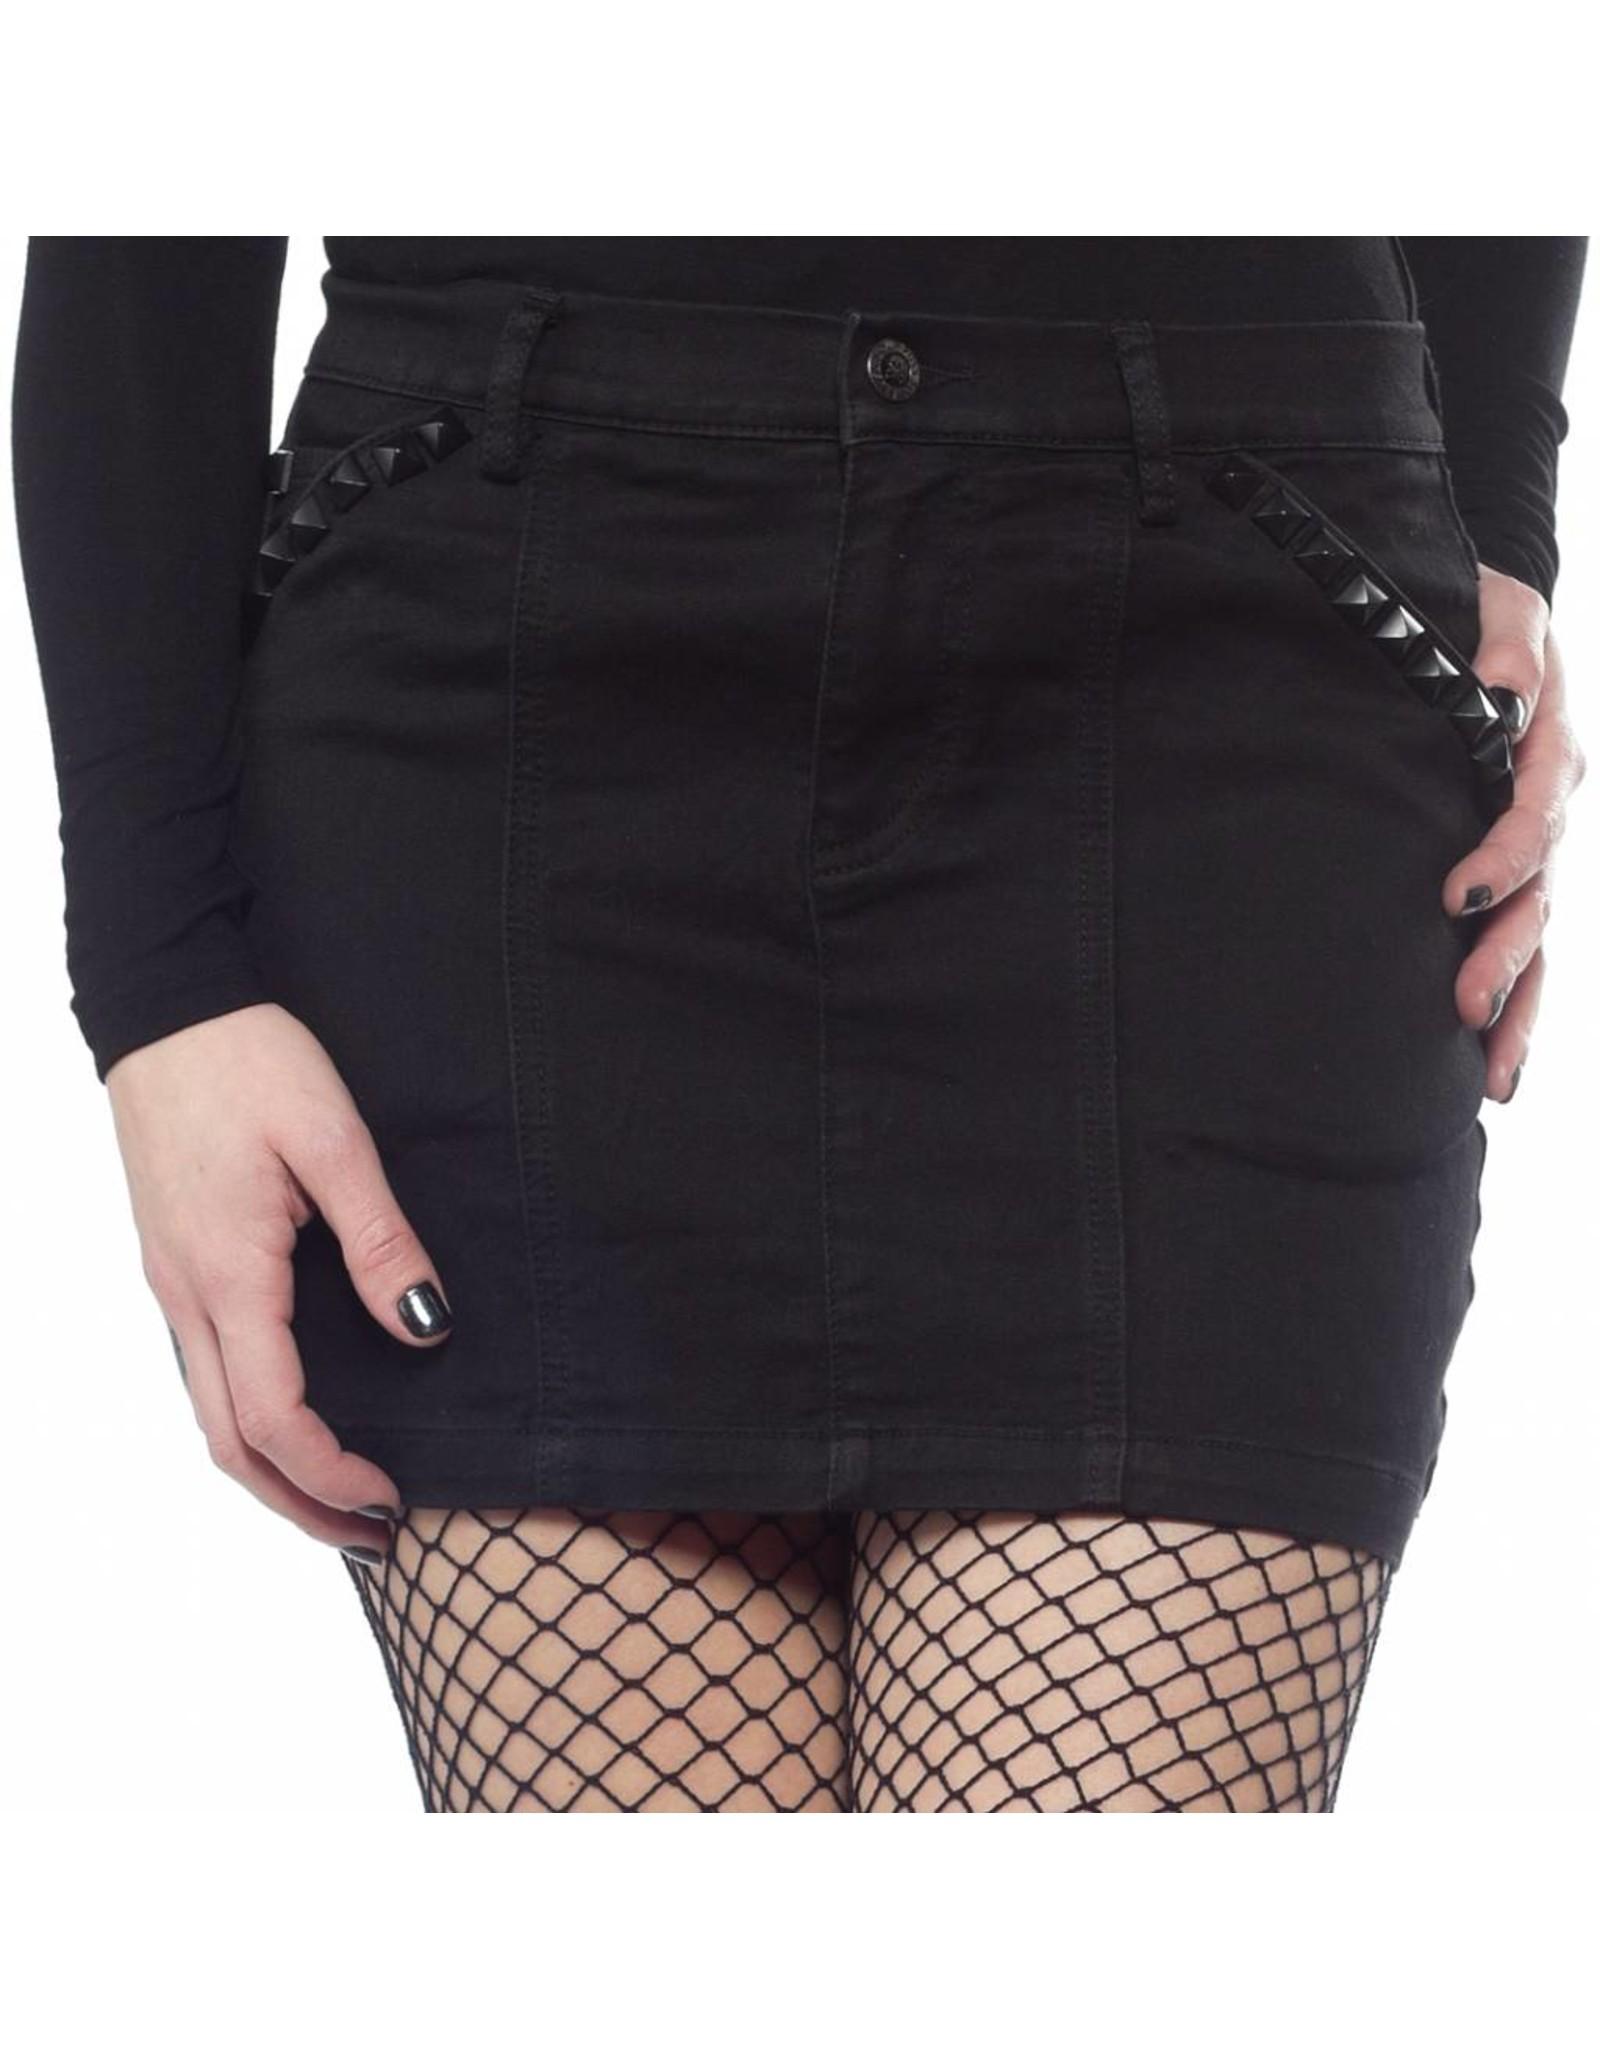 SOURPUSS - Black Studded Mini Skirt